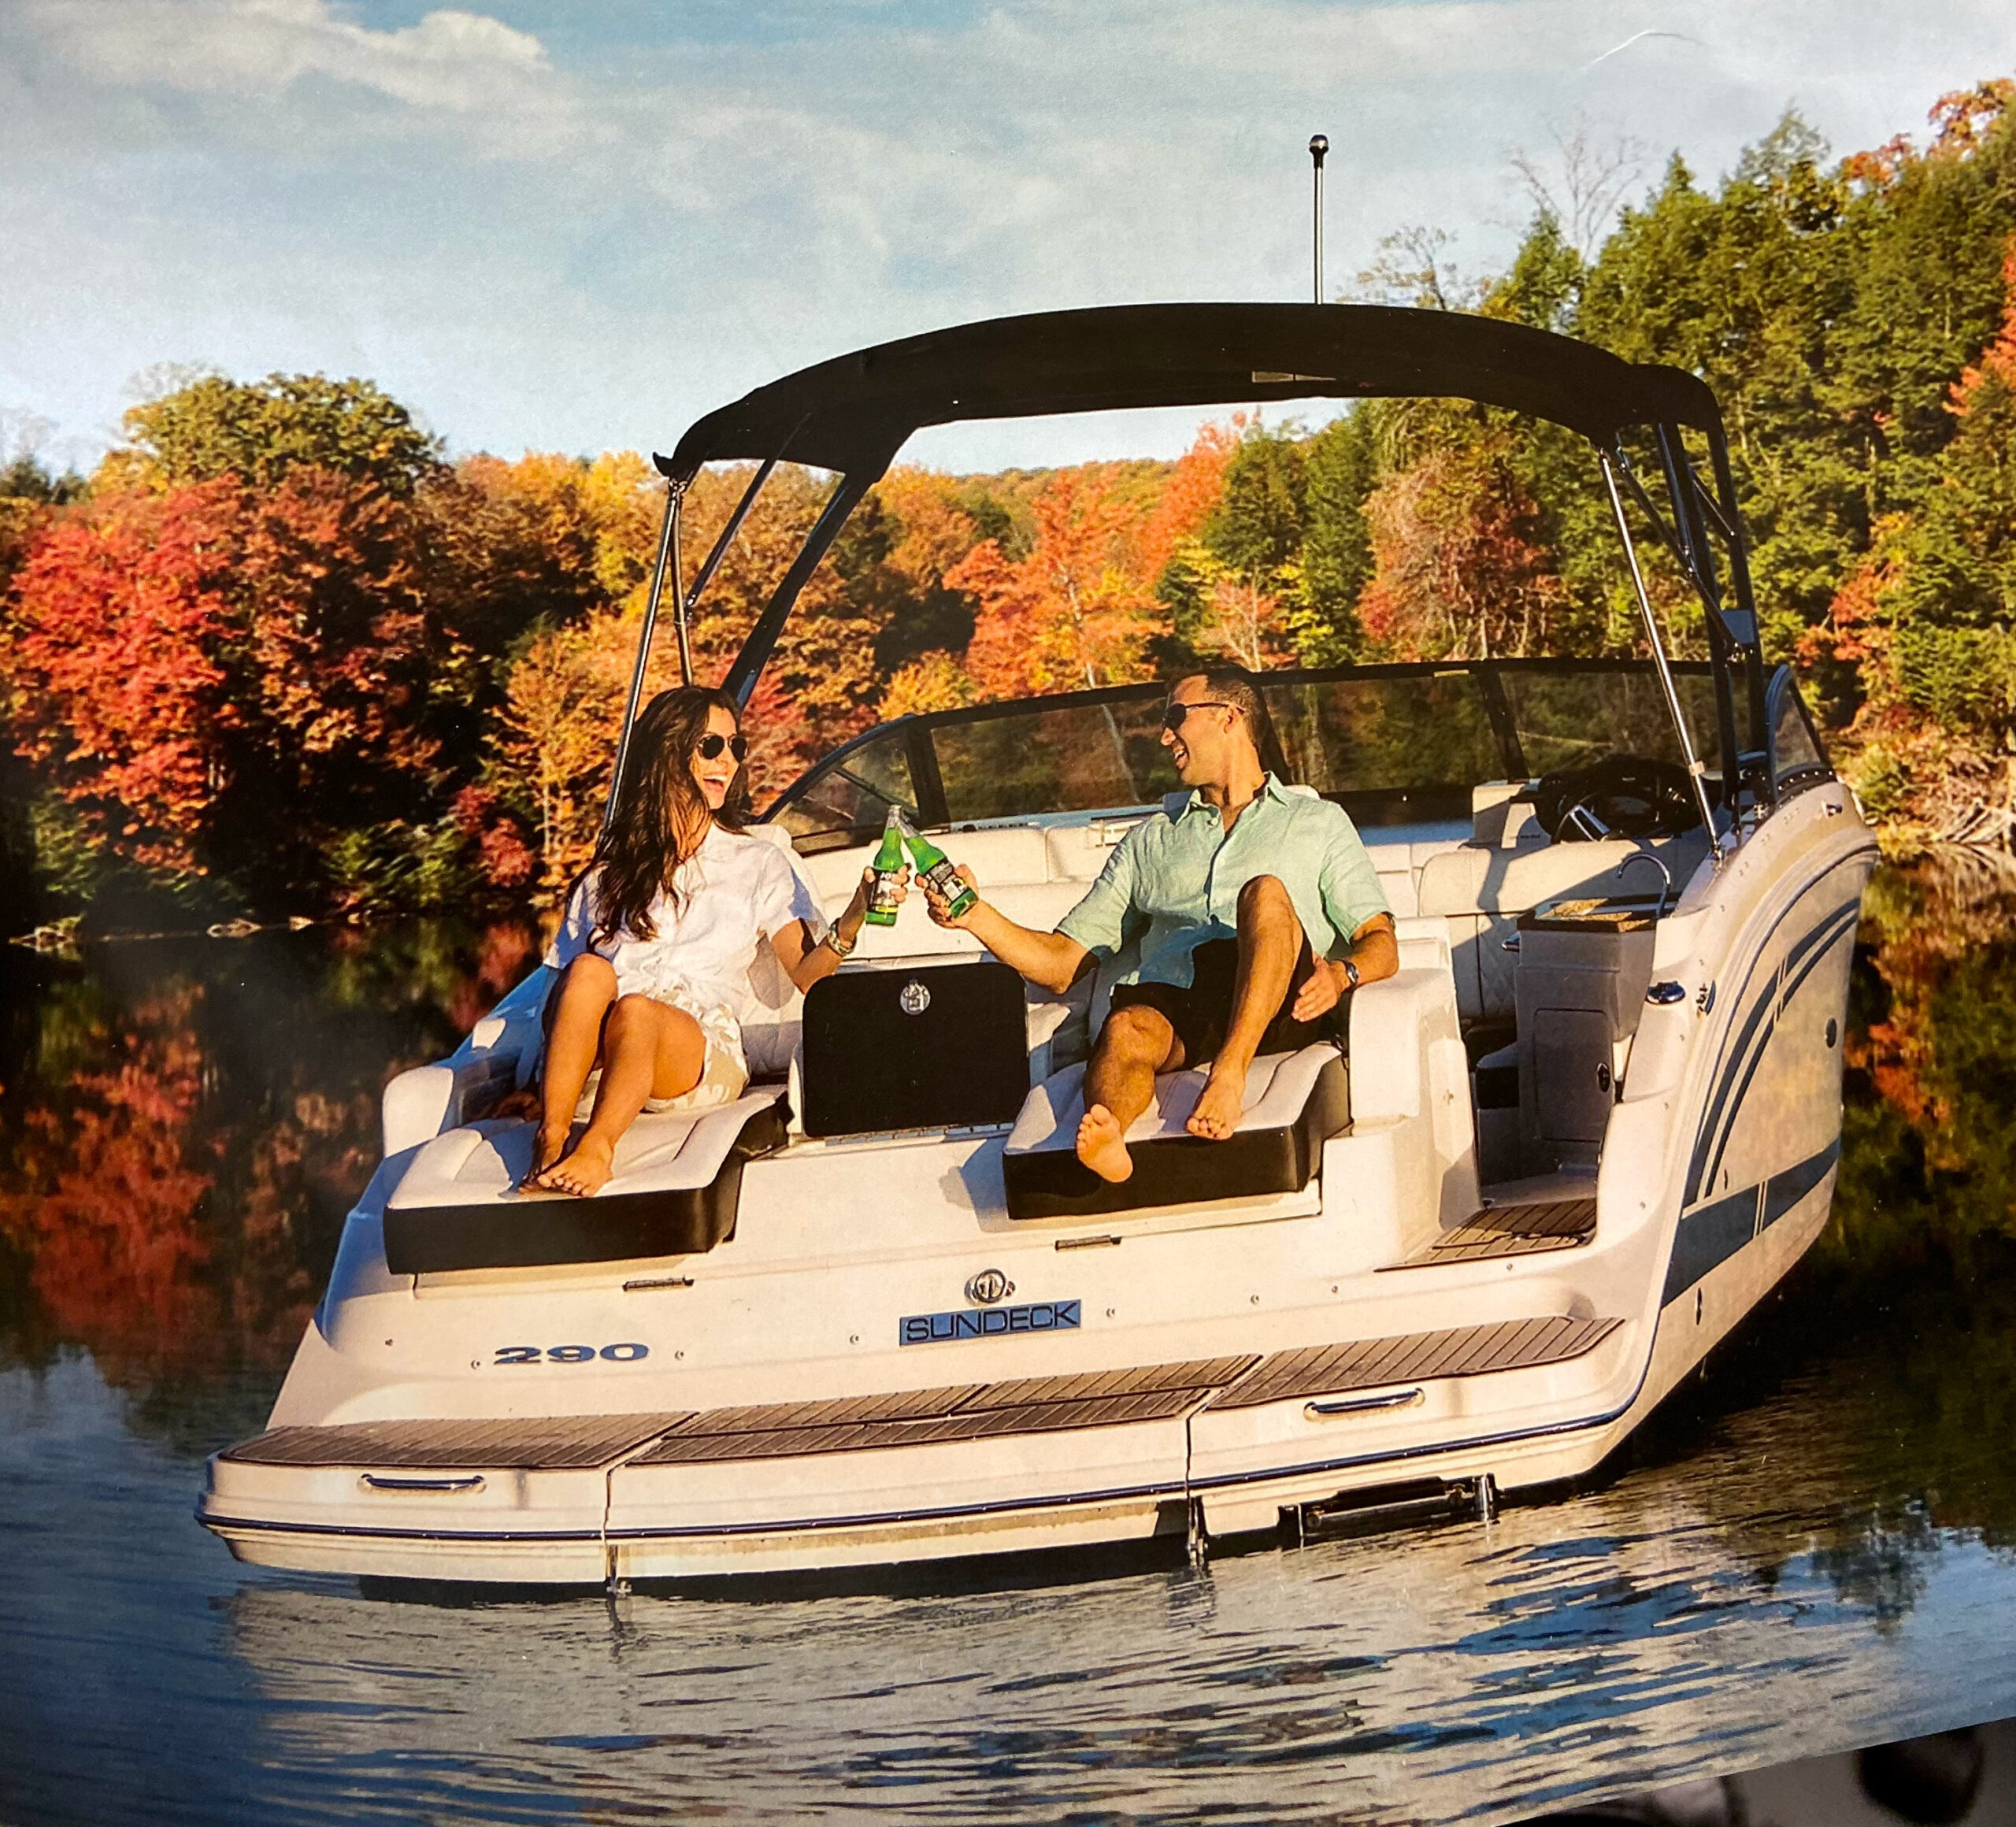 2021 boating,boat motors,mercury outboard,kansas city boat service,boat repair